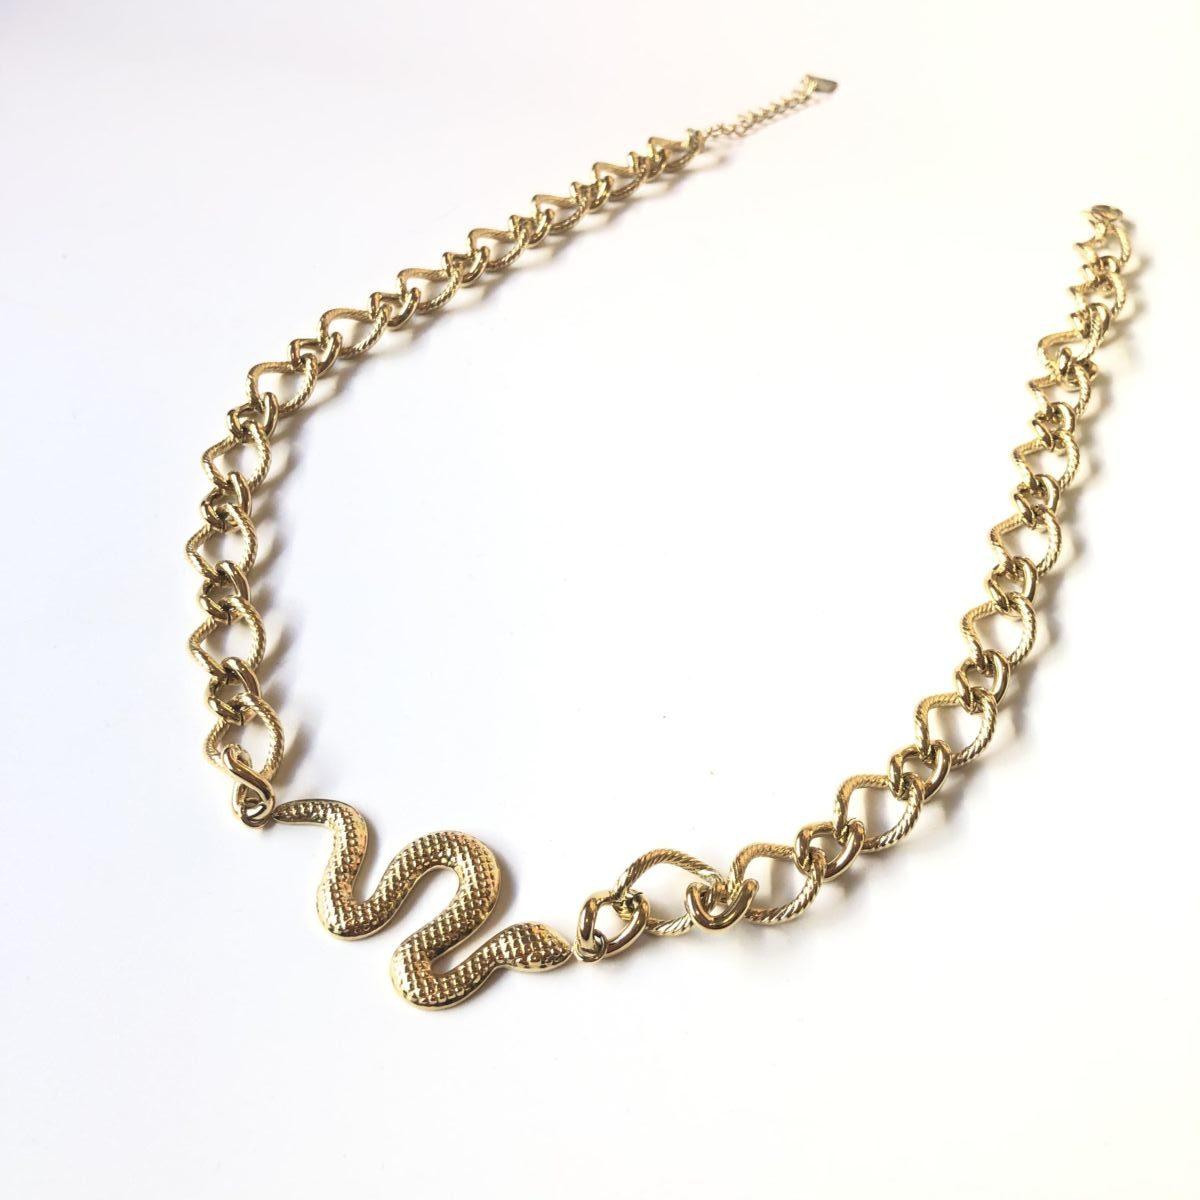 collier grosse chaine gros maillons dorée pendentif serpent by destele